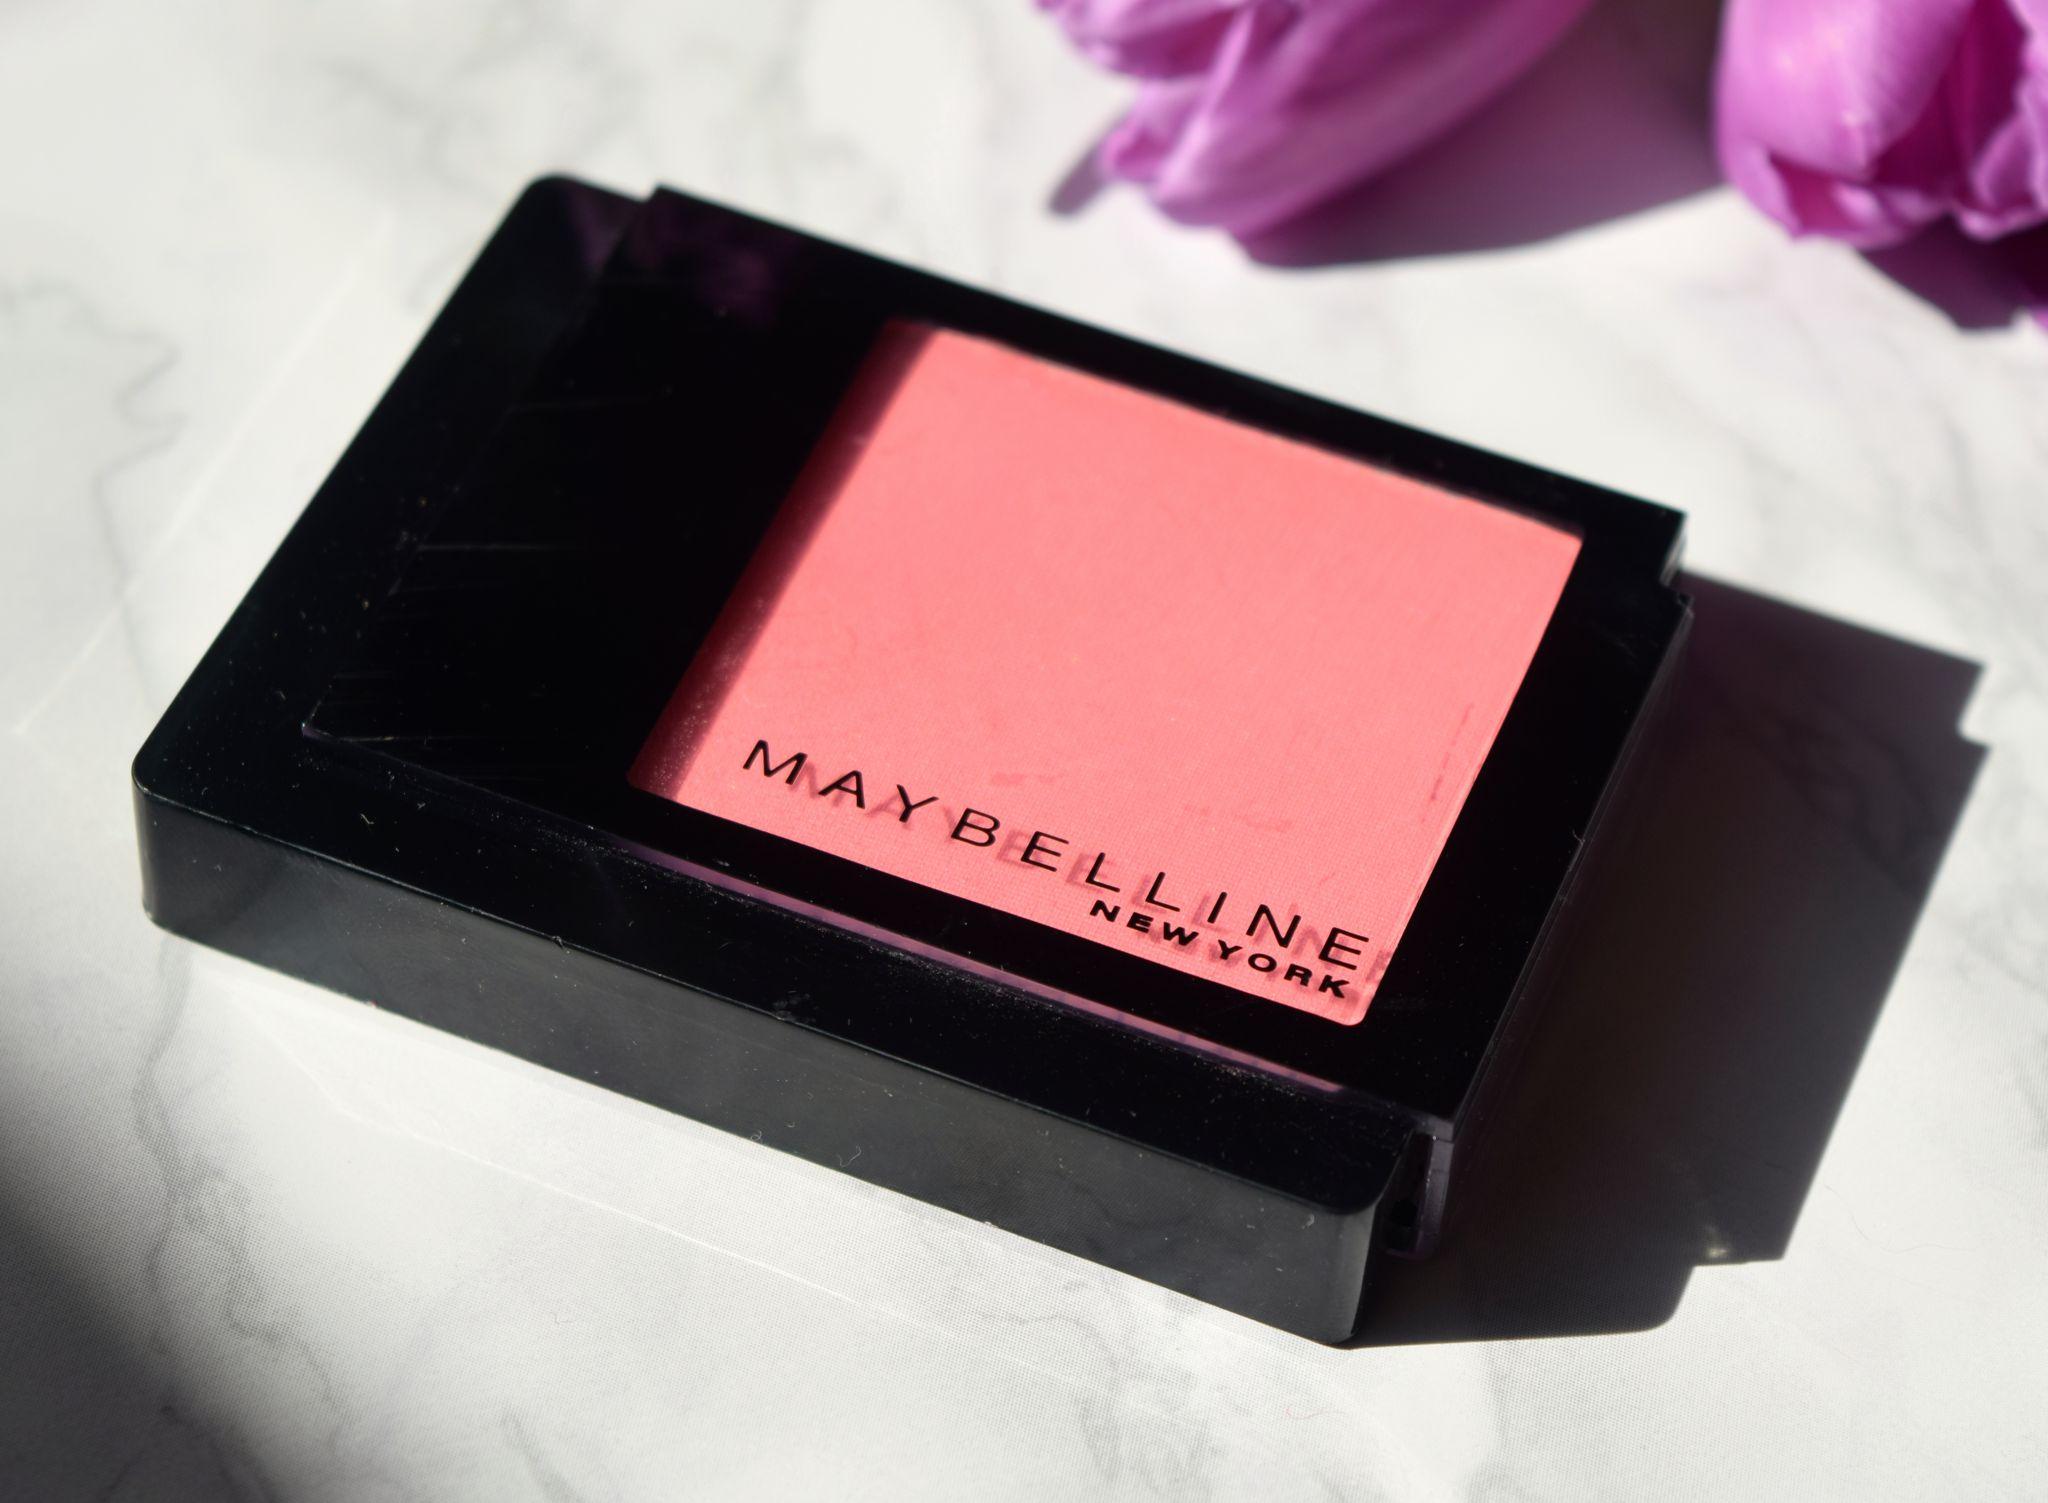 Maybelline Studio Blush